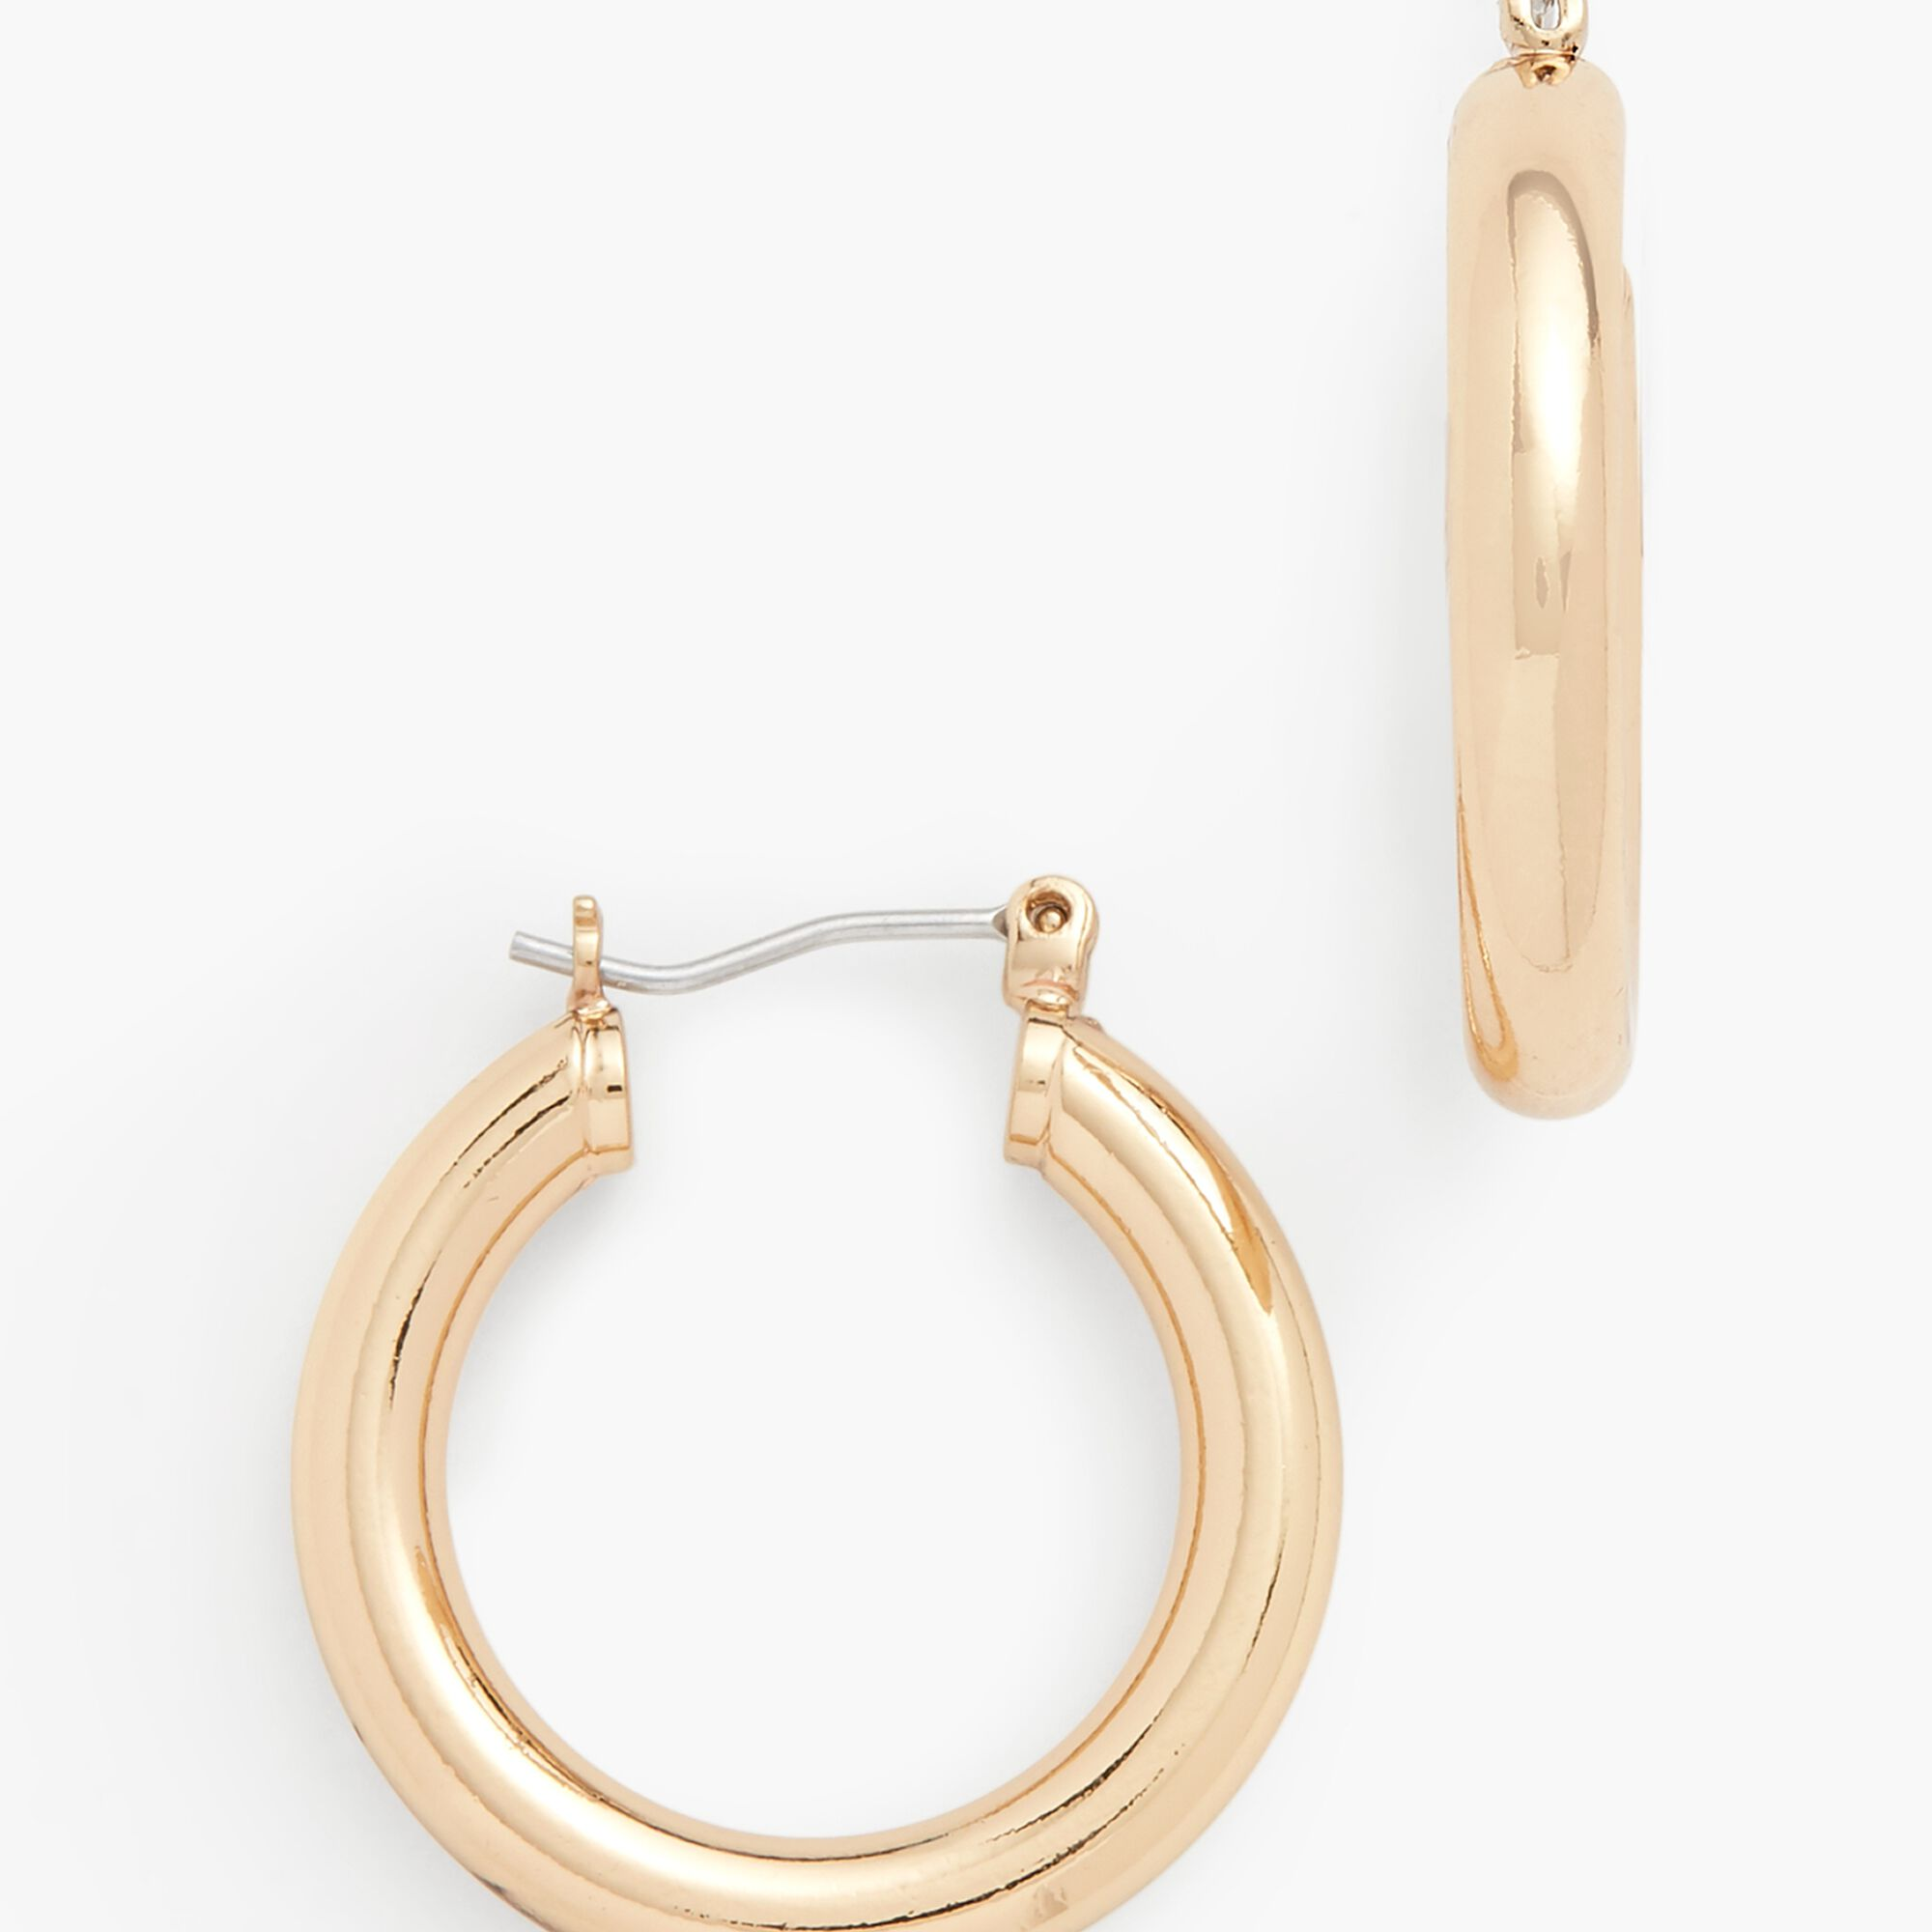 8c84e8ff6 Classic Hoop Earrings Opens a New Window.